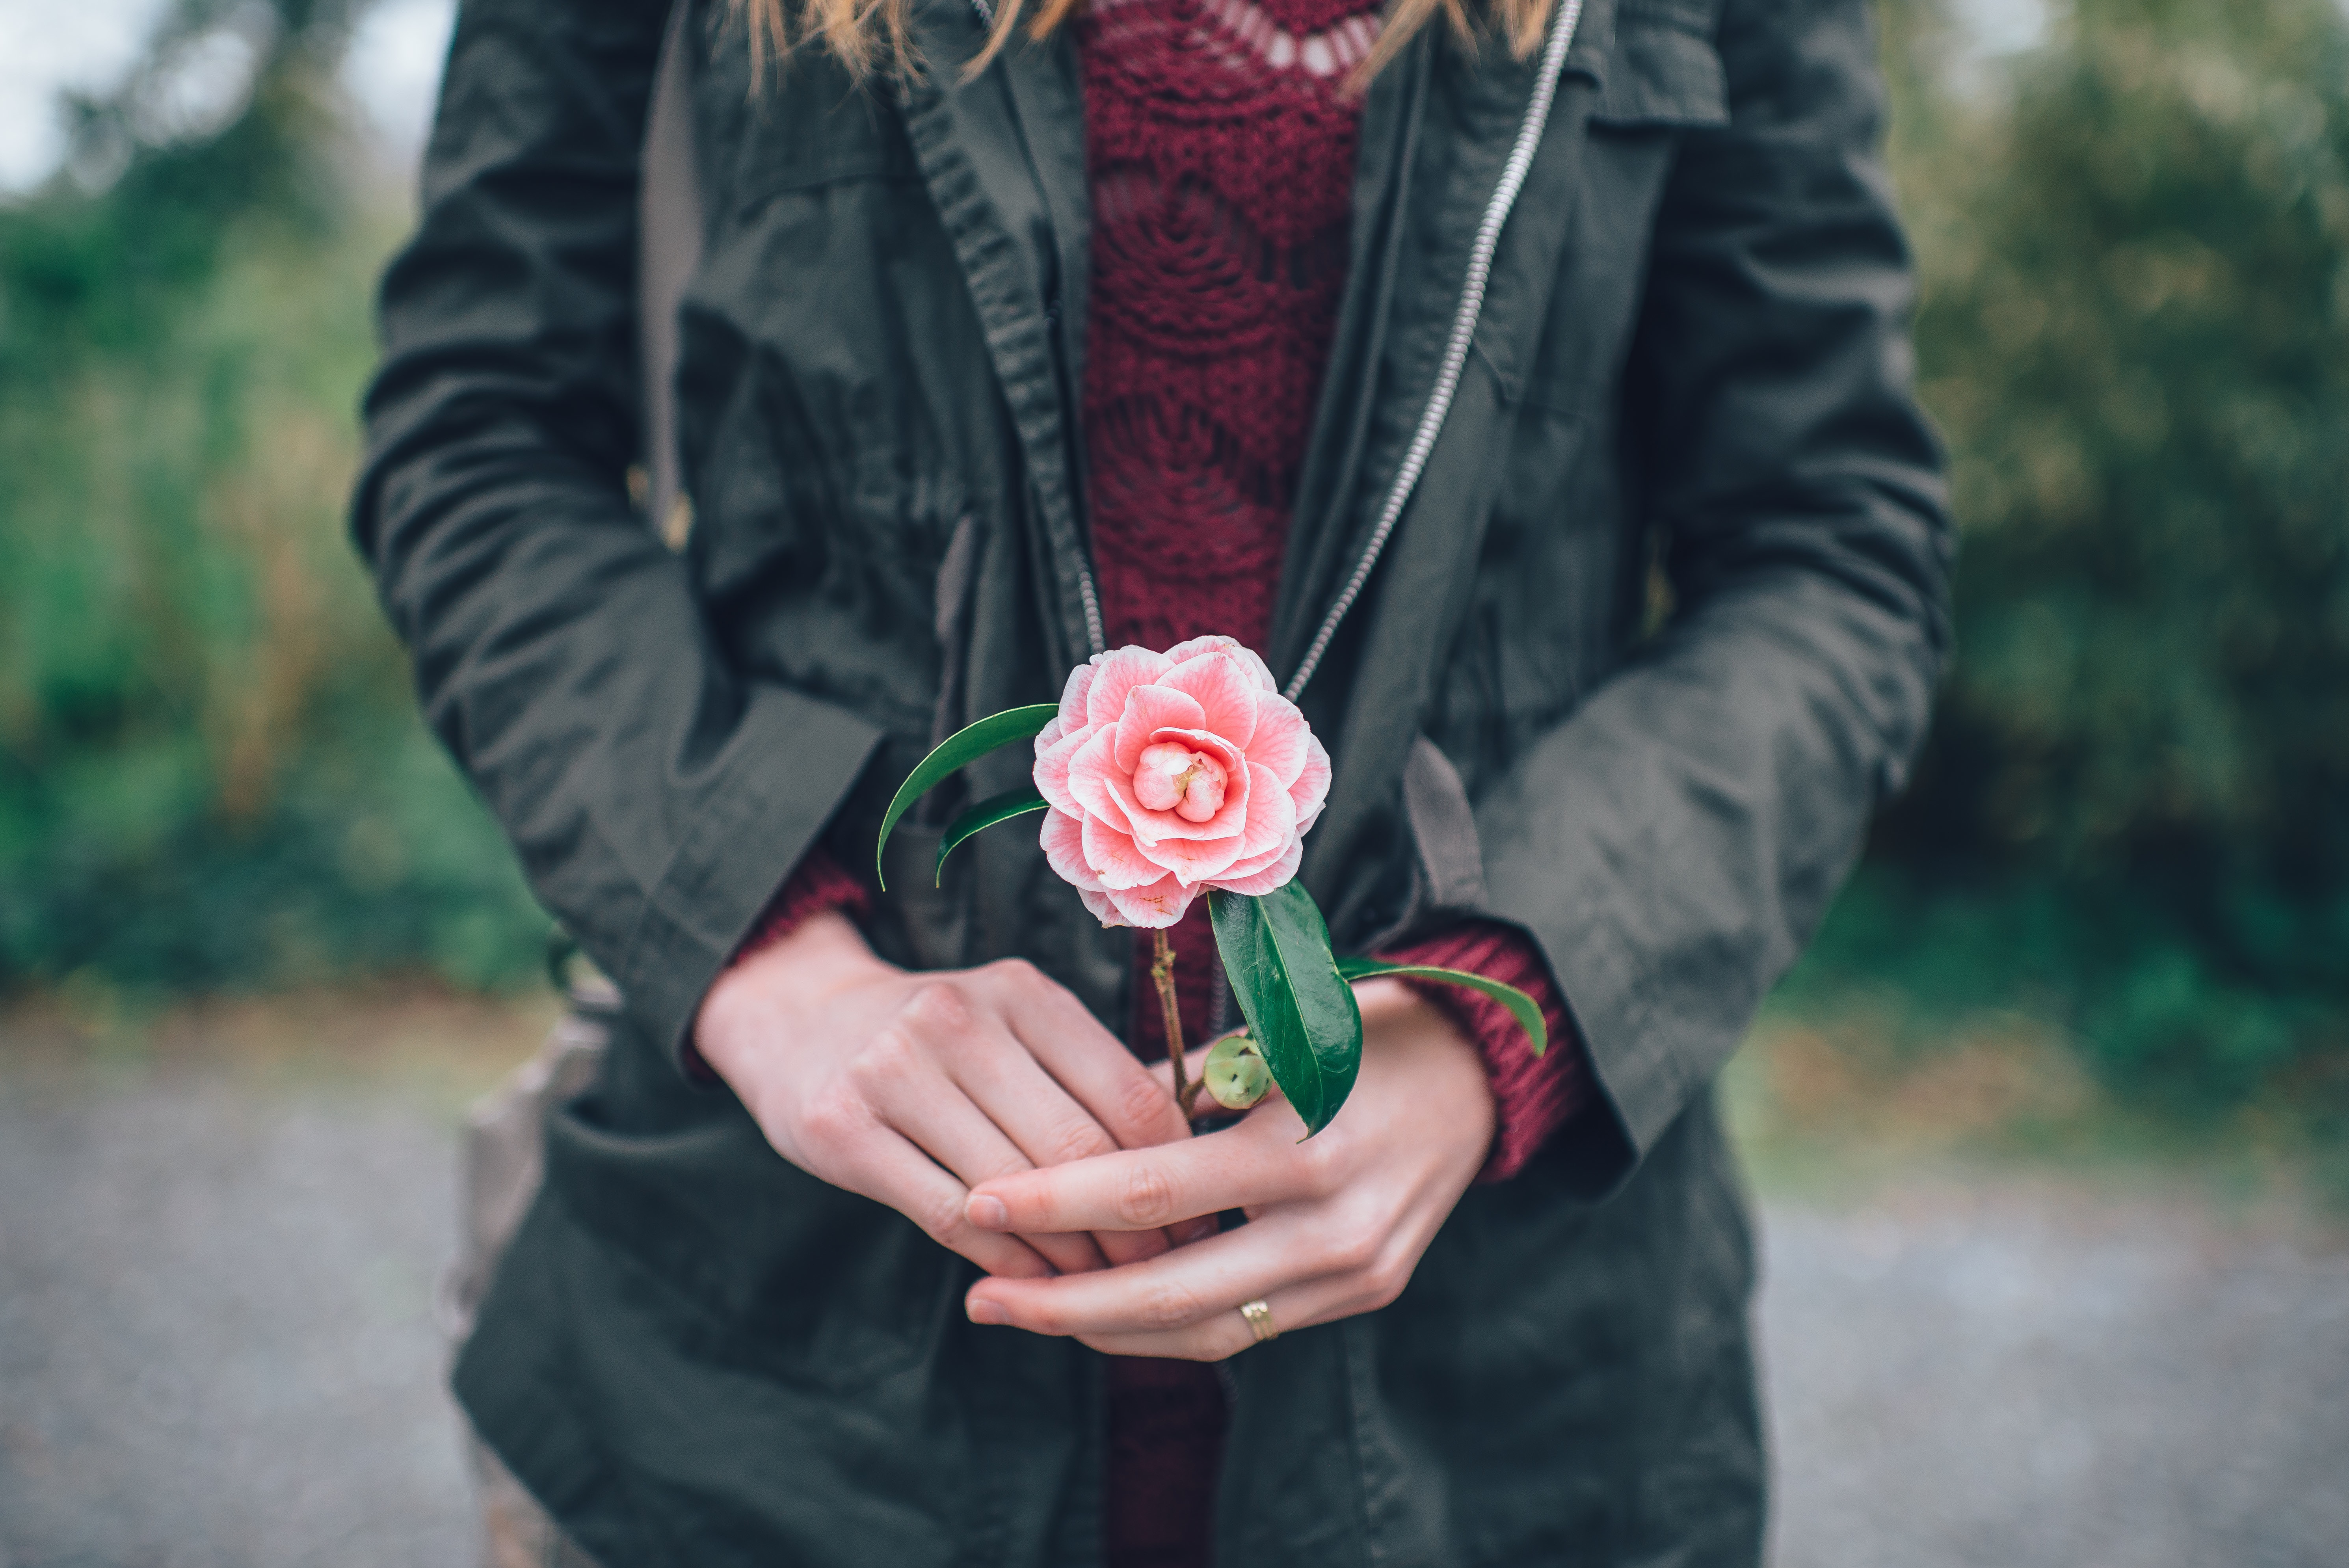 Люди с розами